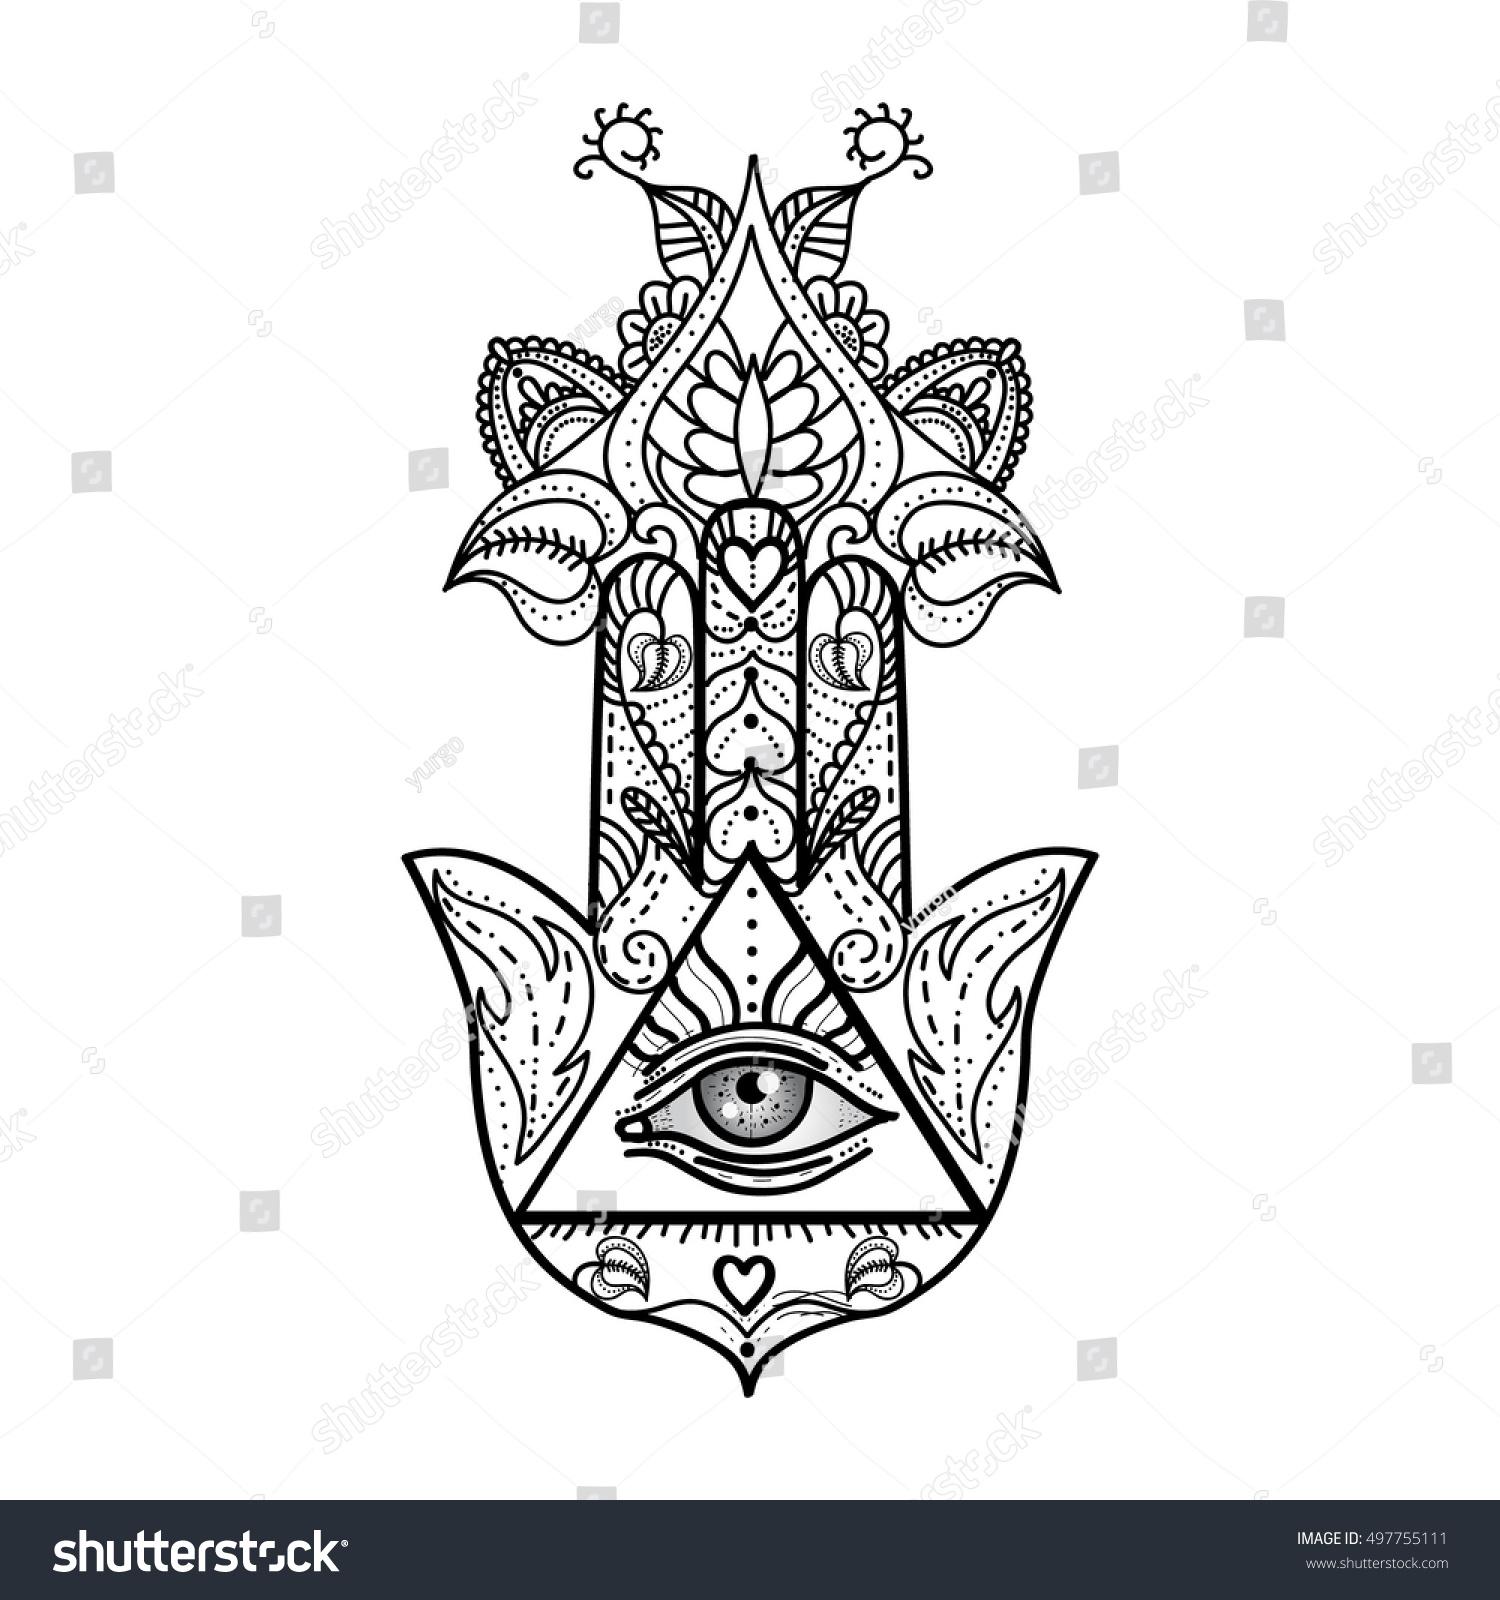 Vector Drawing Hamsa Hand All Seeing Stock Vector Royalty Free